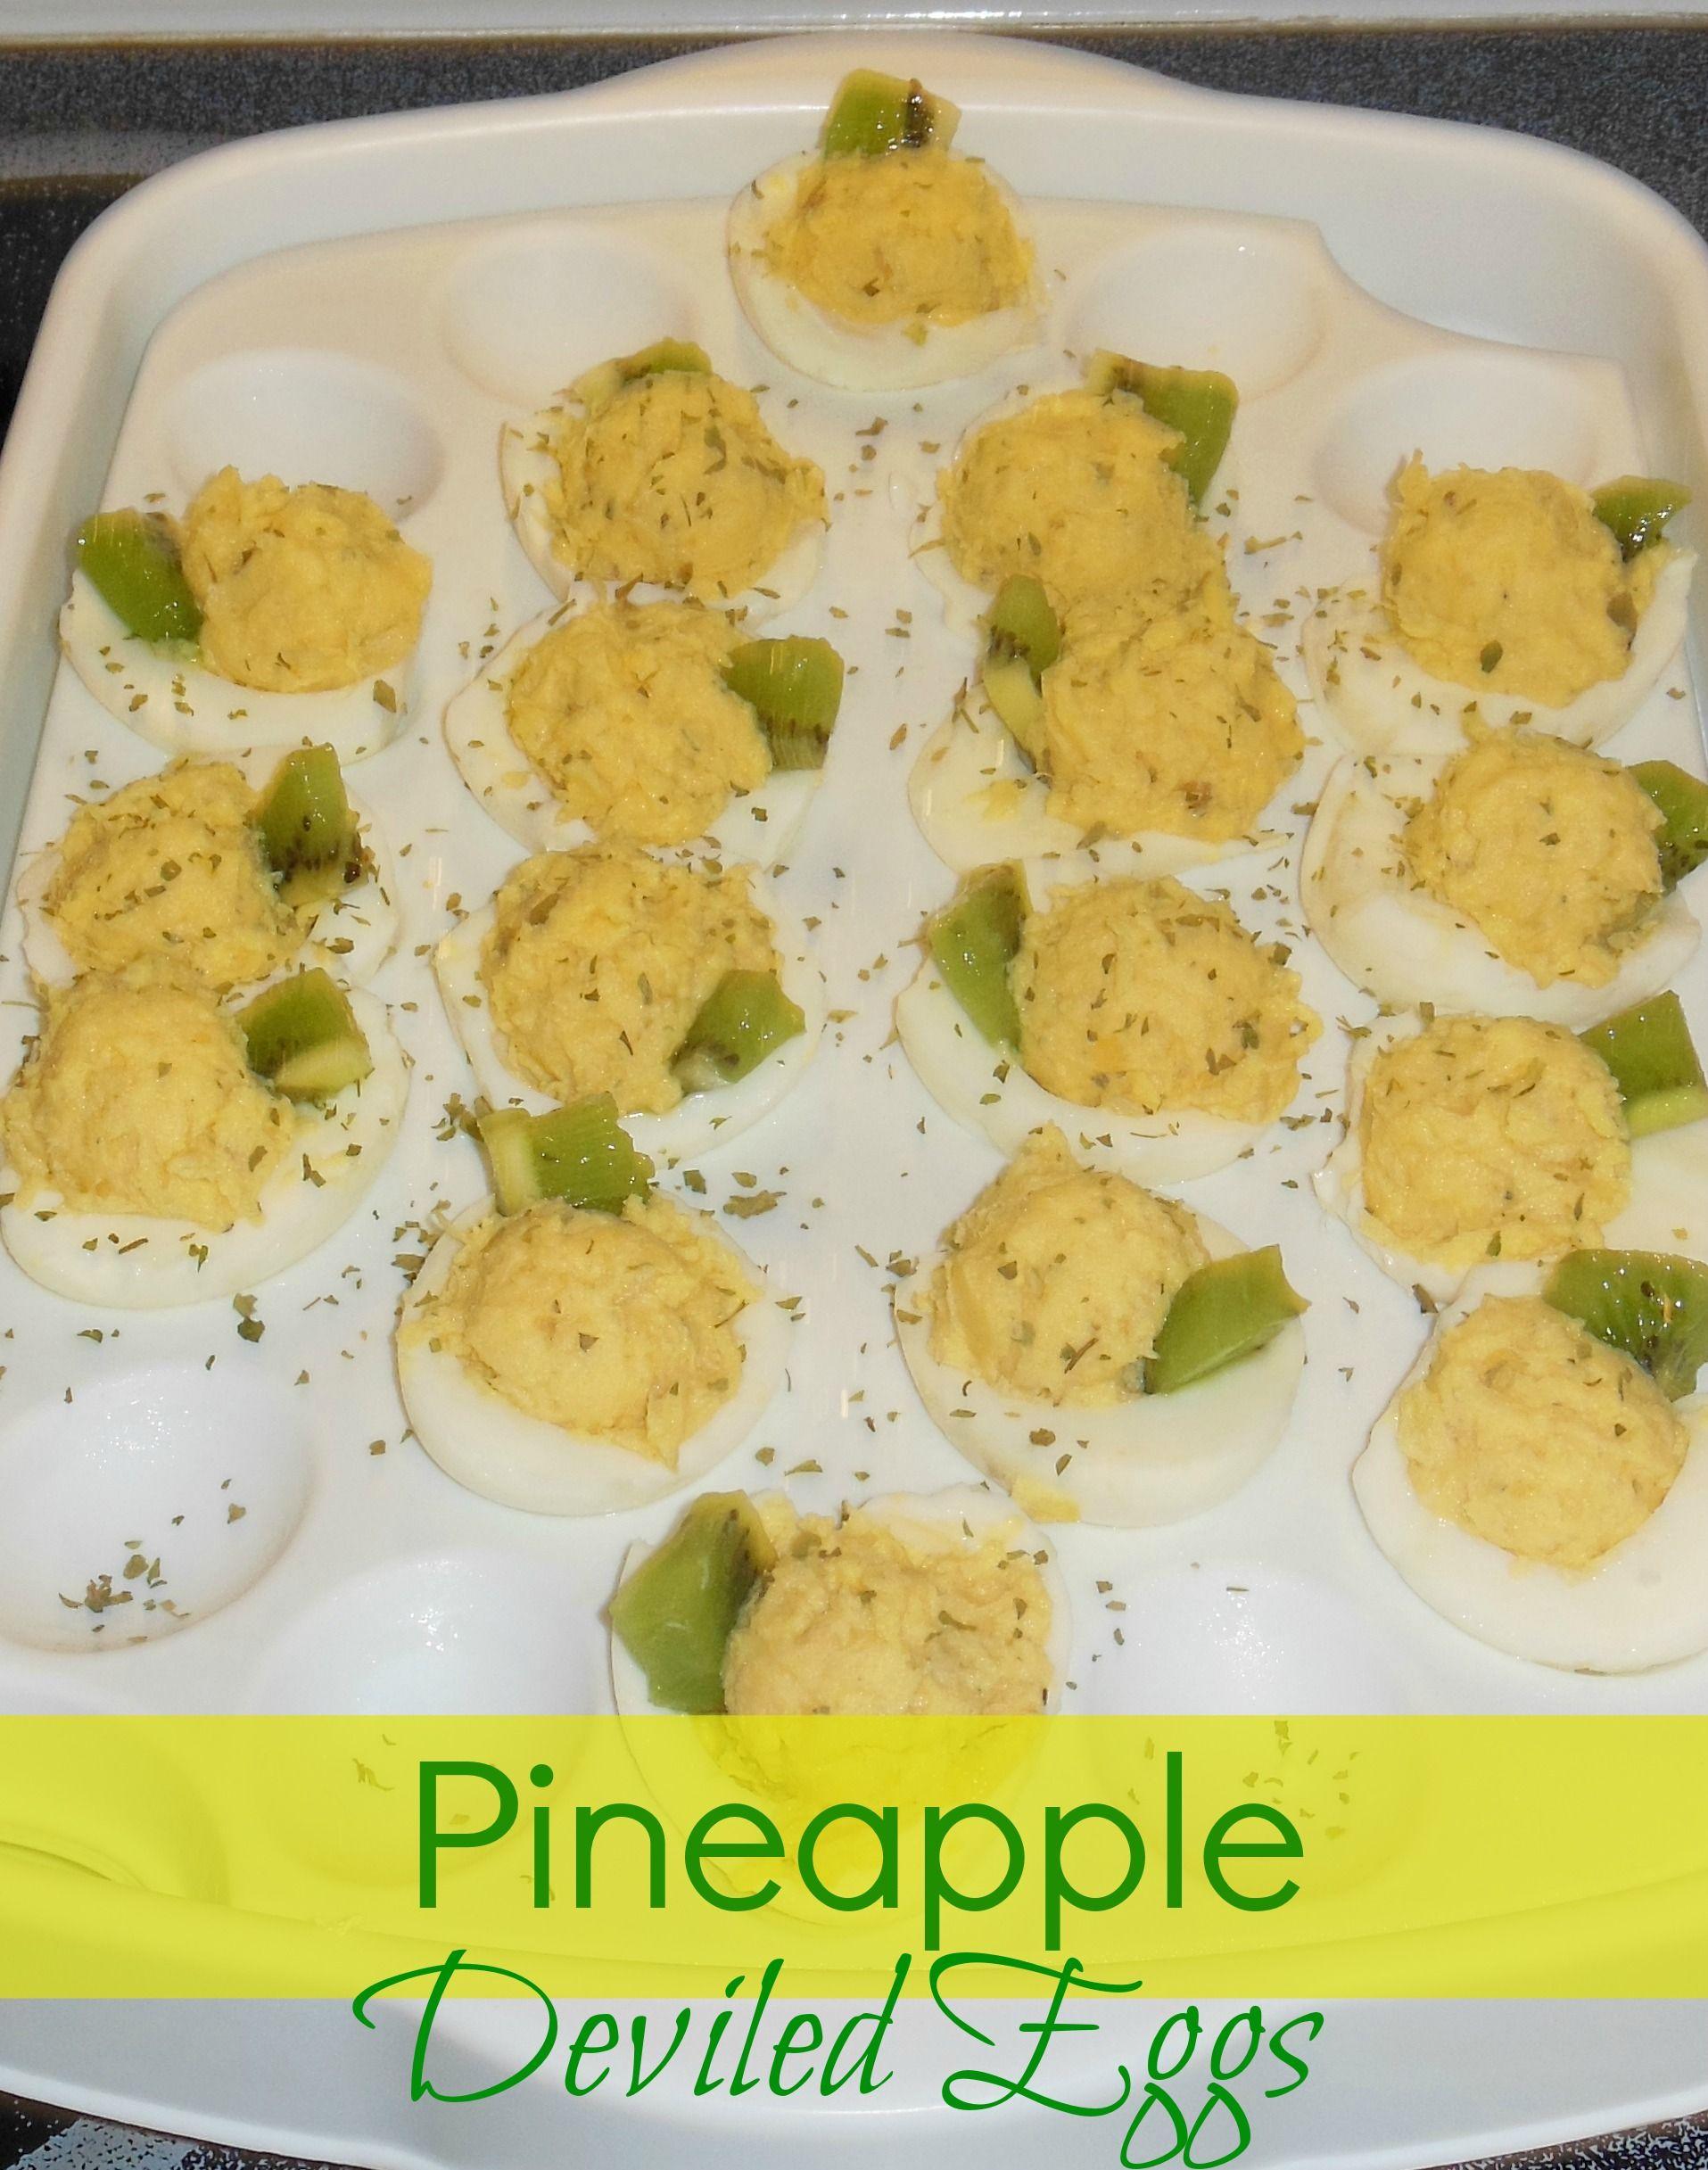 1000+ images about Food - Deviled Eggs on Pinterest | Bacon, Devil ...